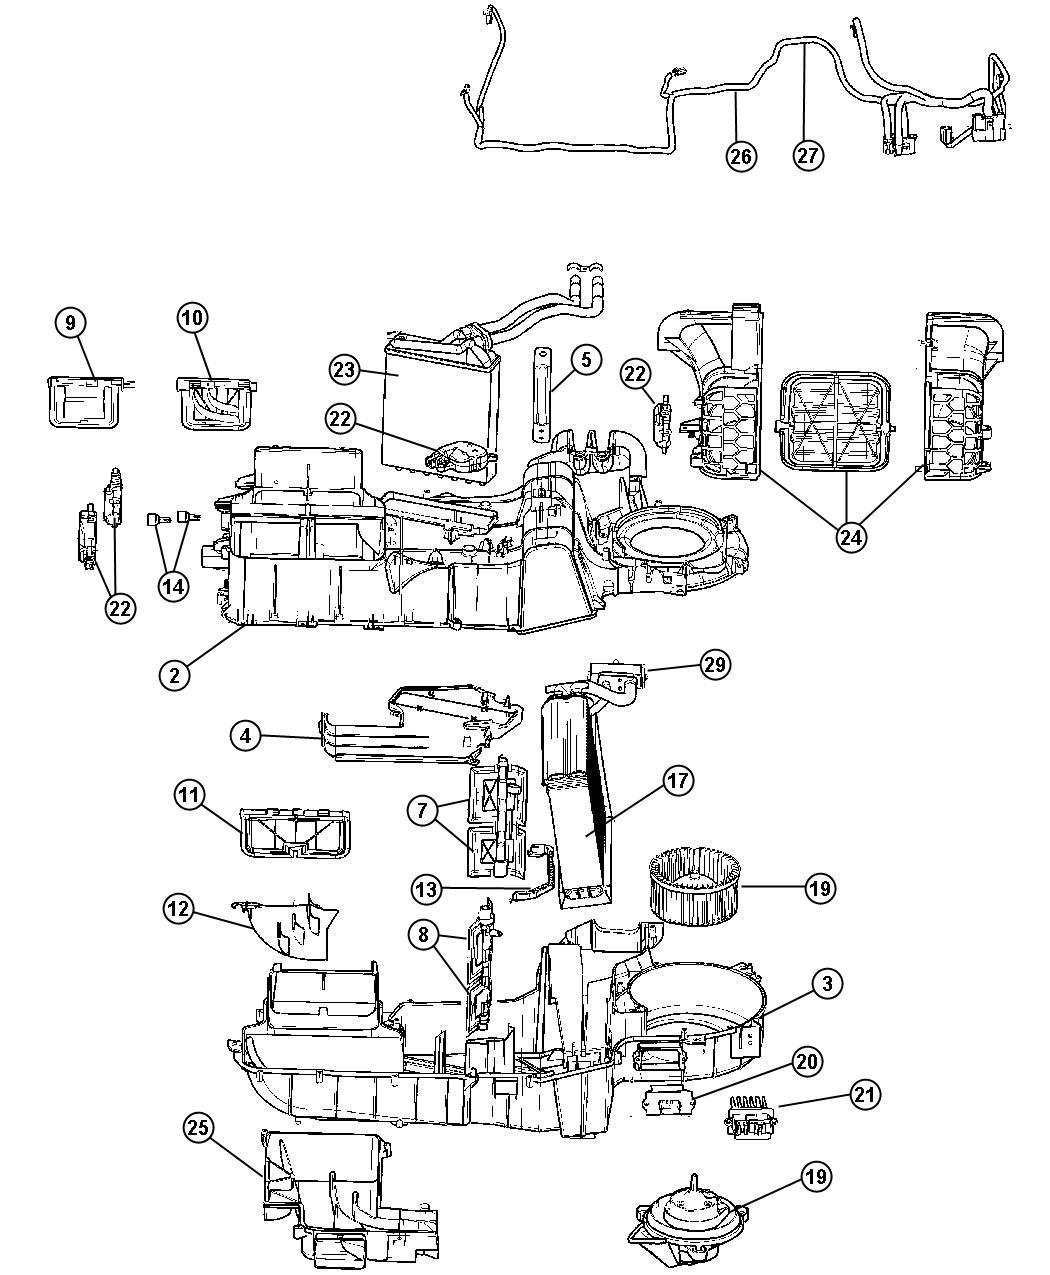 Chrysler Aspen Housing kit. Used for: a/c and heater. [air